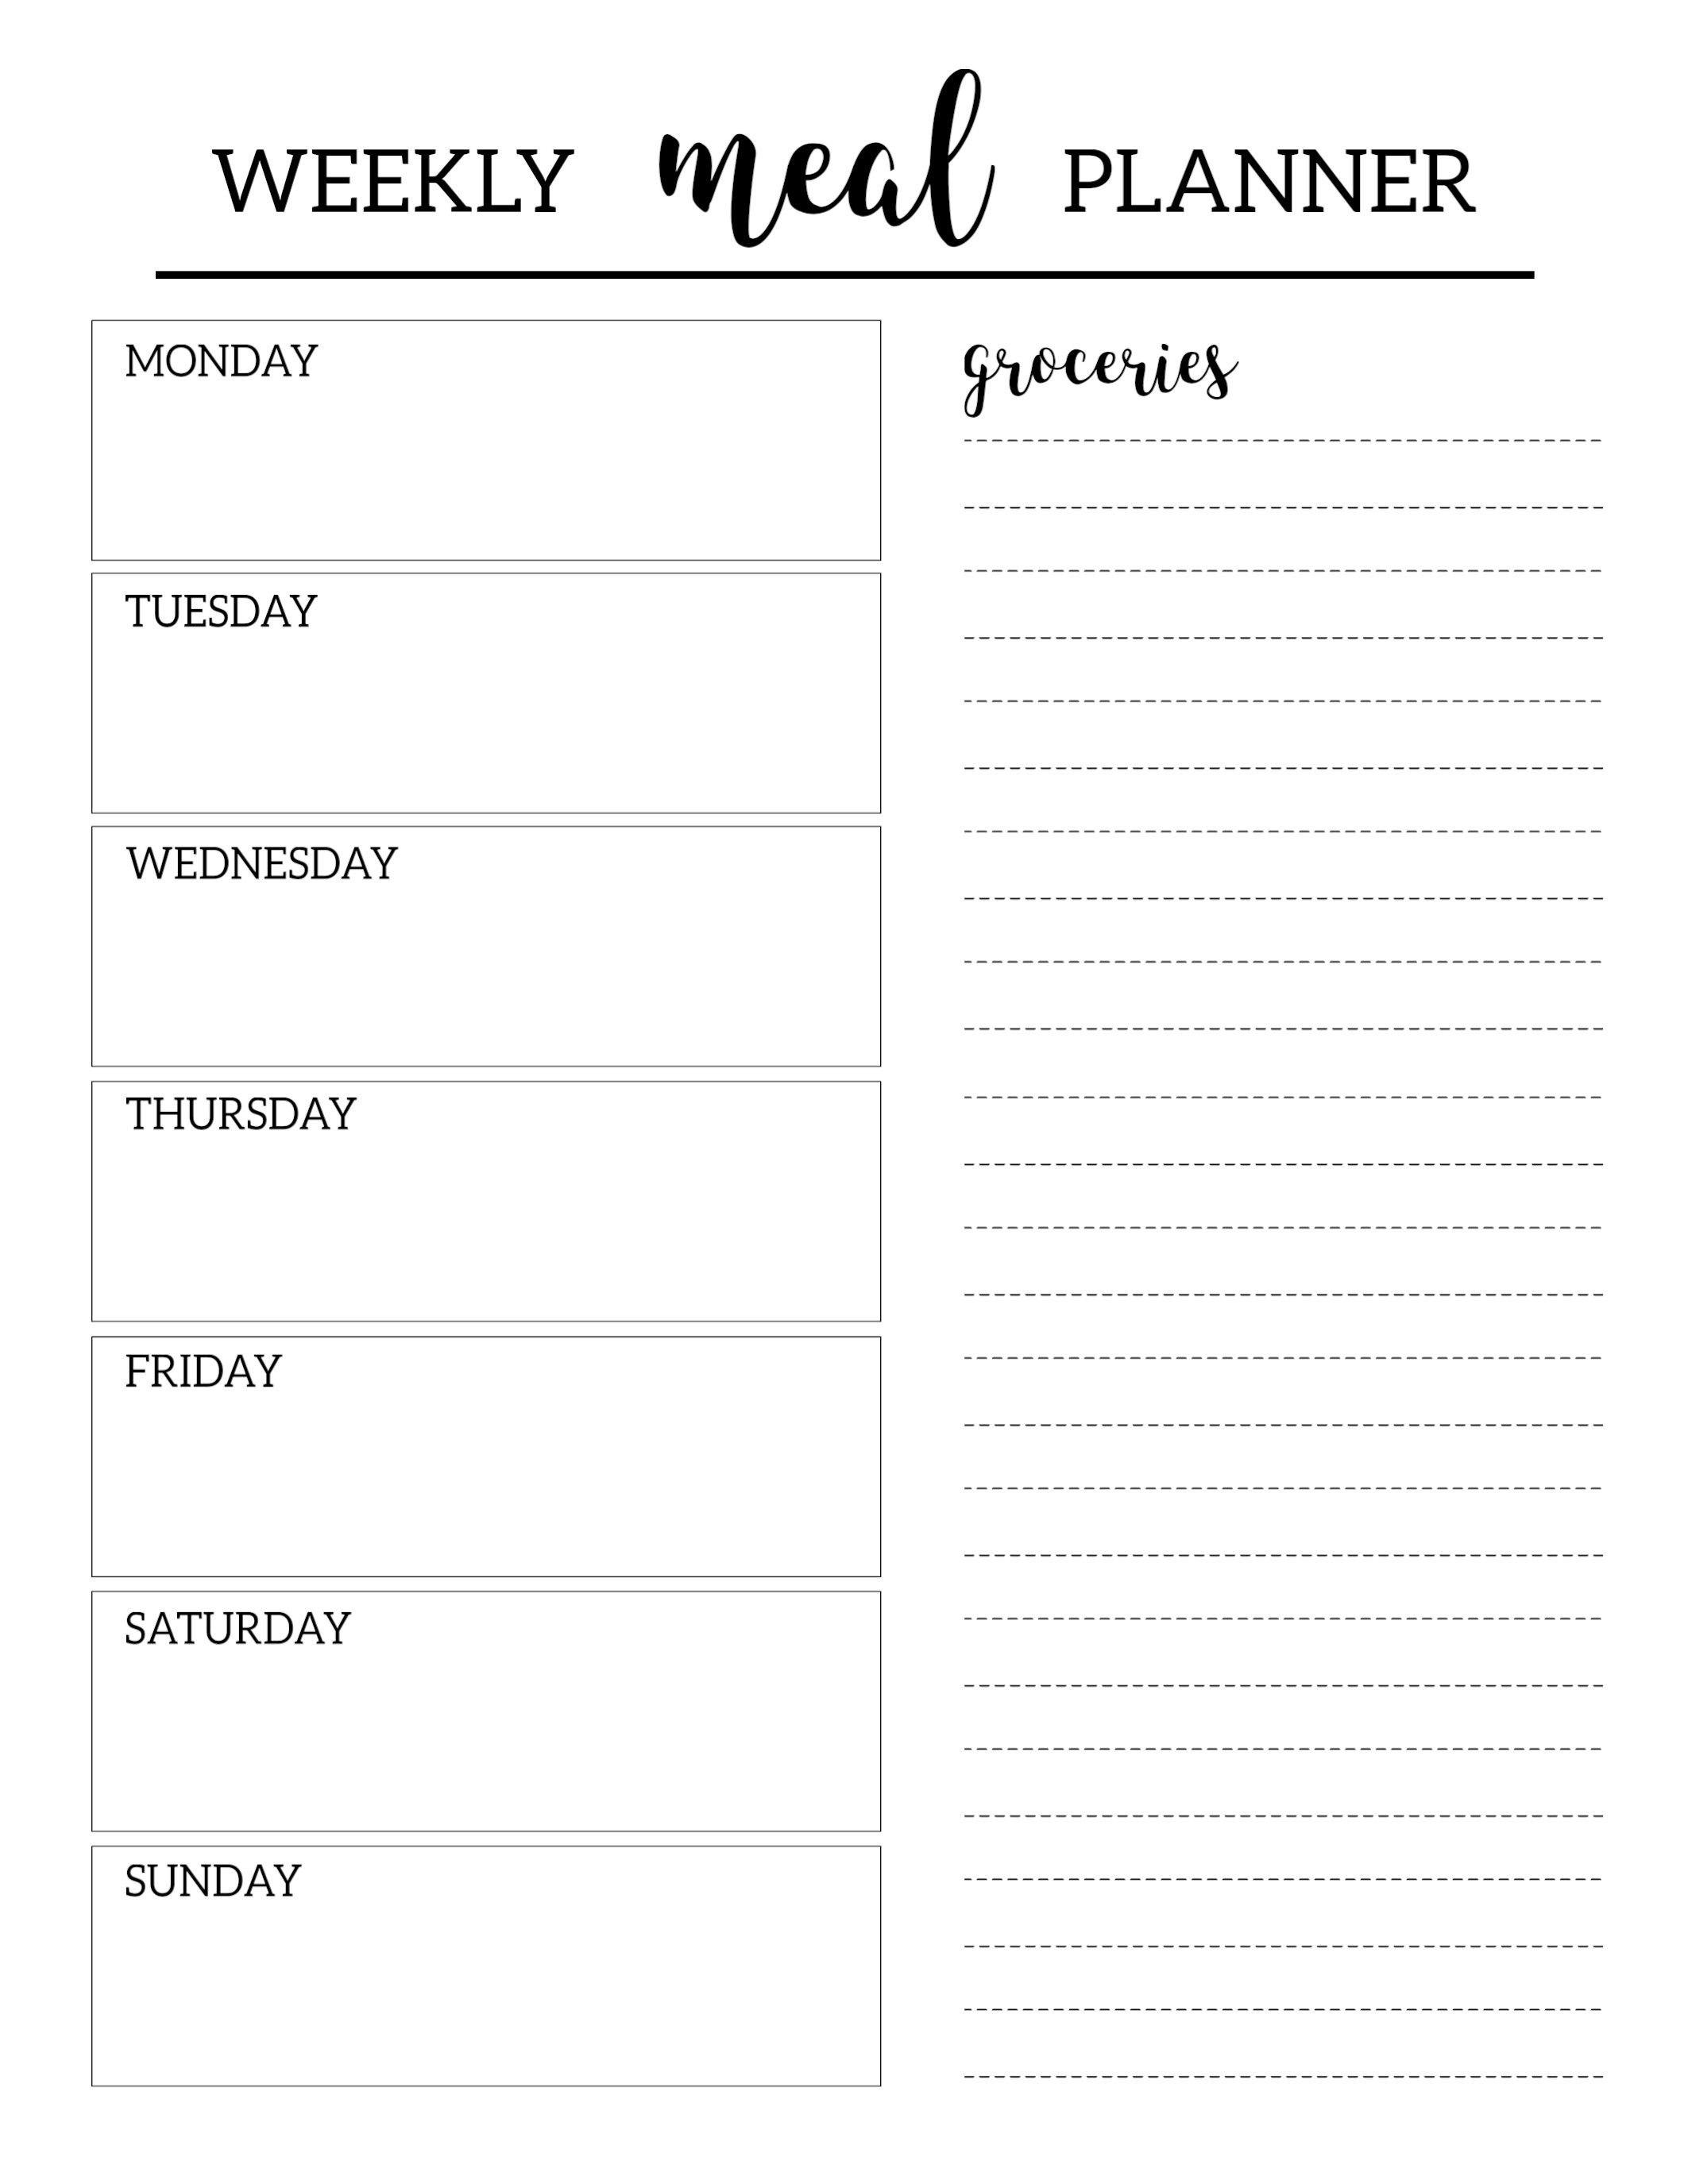 Free Printable Meal Planner Template  Organization  Meal Planner Inside Weekly Meal Planner Template Word